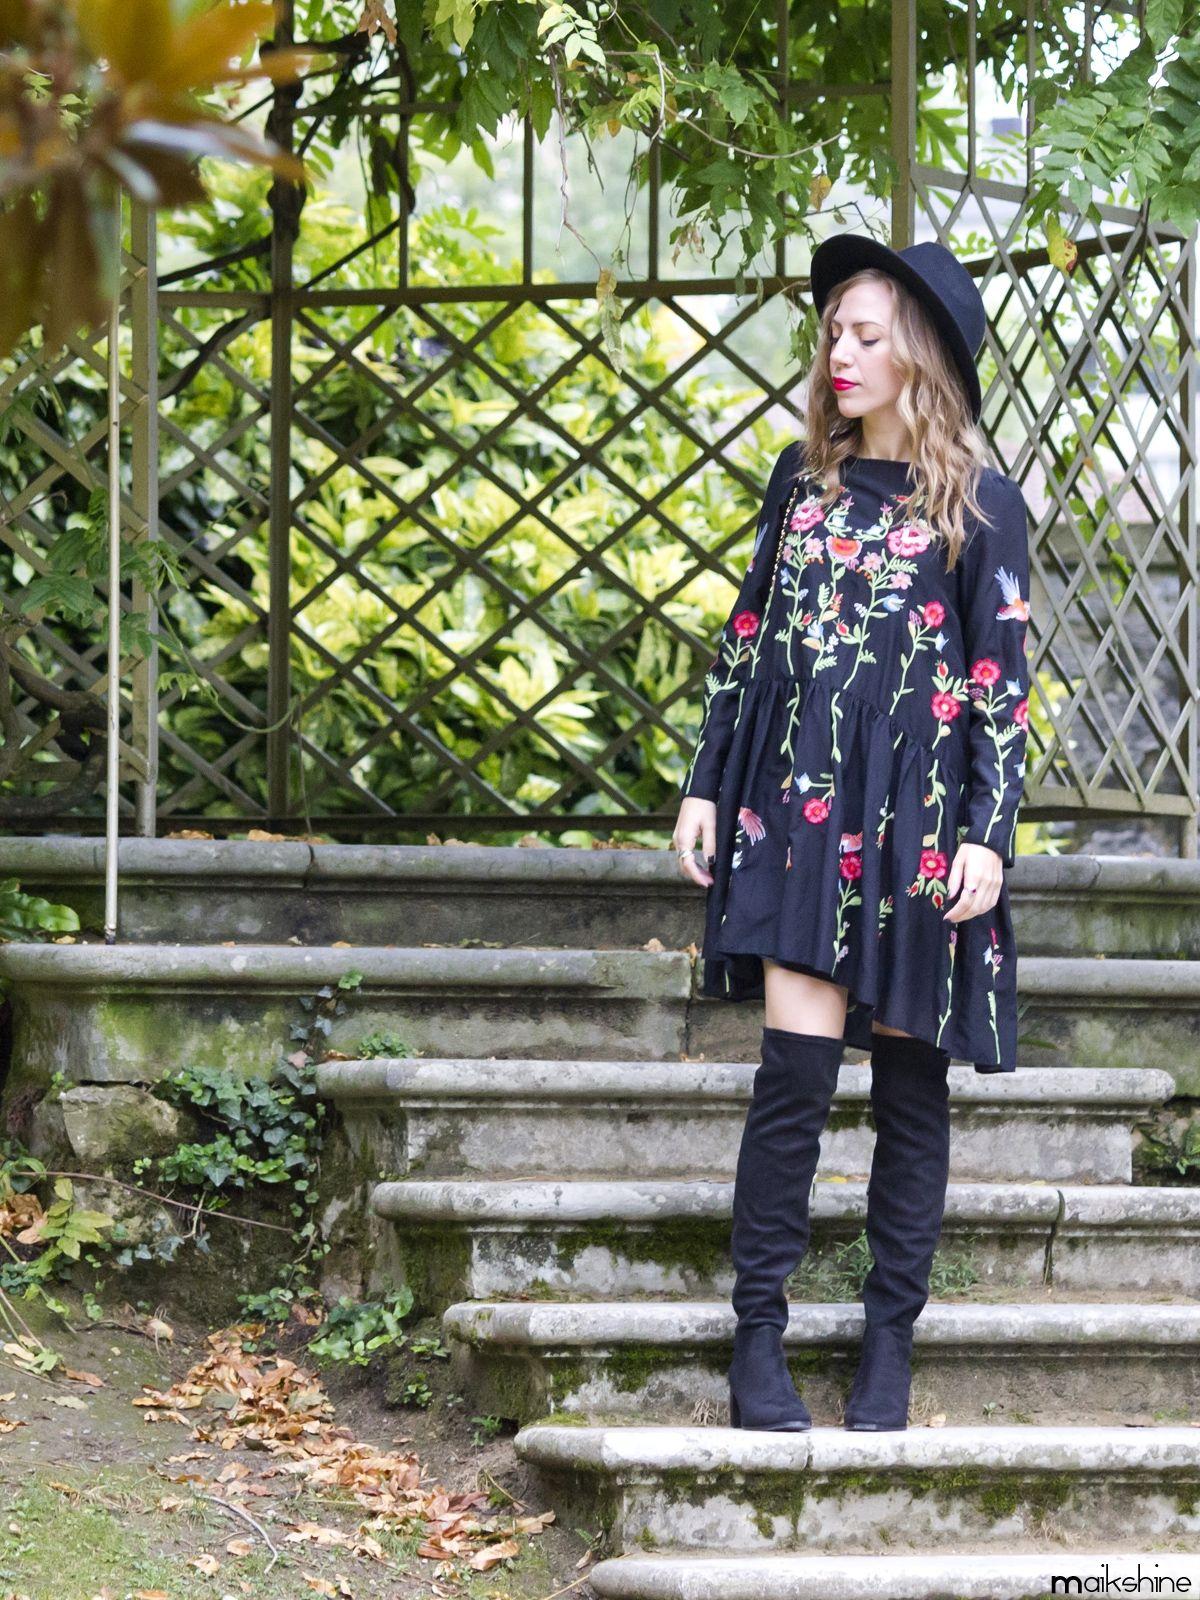 0672ce4ed4f Vestido bordado floral - Temporada  Otoño-Invierno - Tags  Outfit